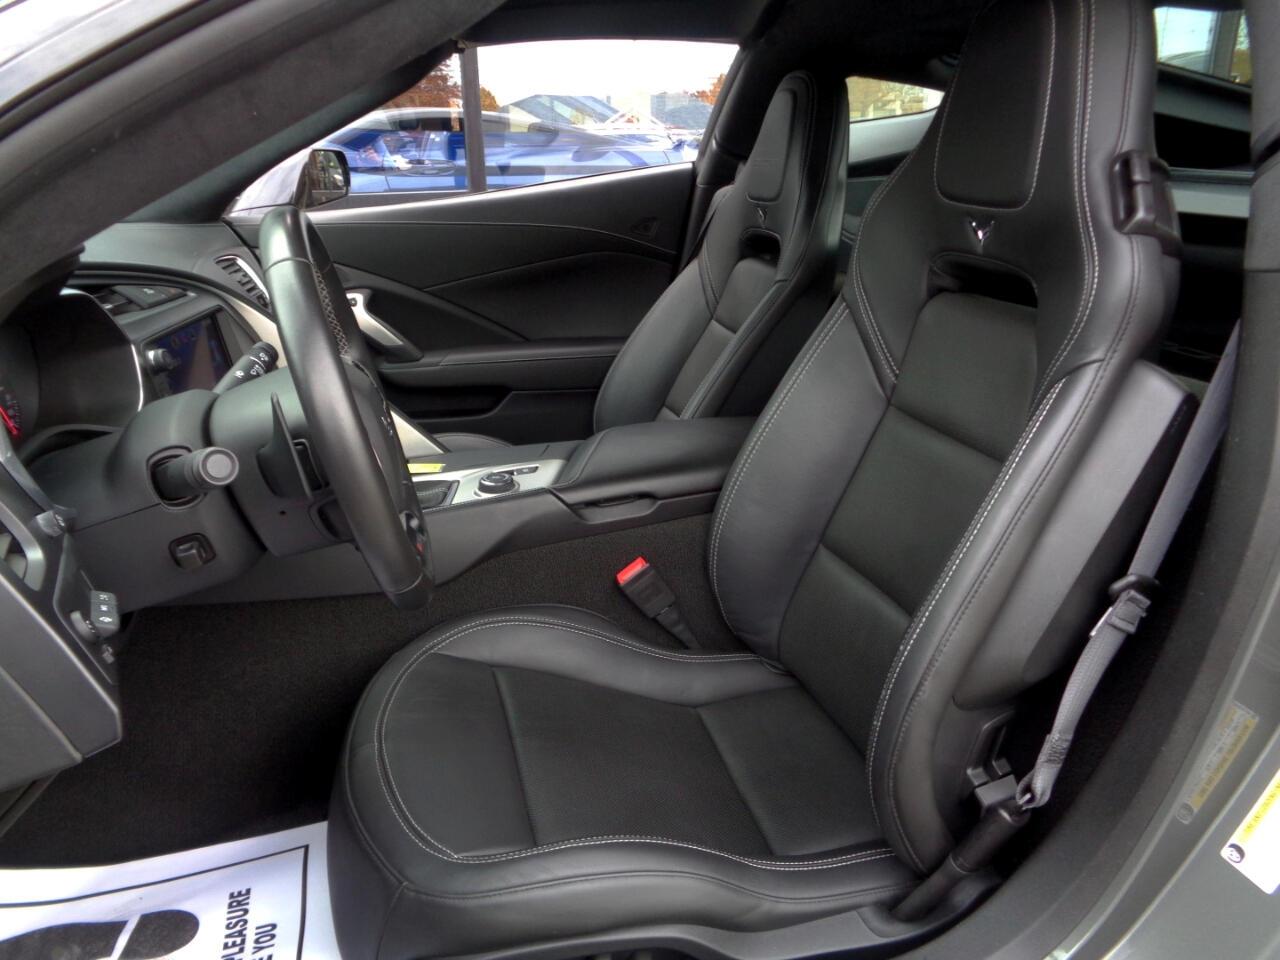 2015 Gray Chevrolet Corvette Z06 3LZ   C7 Corvette Photo 10